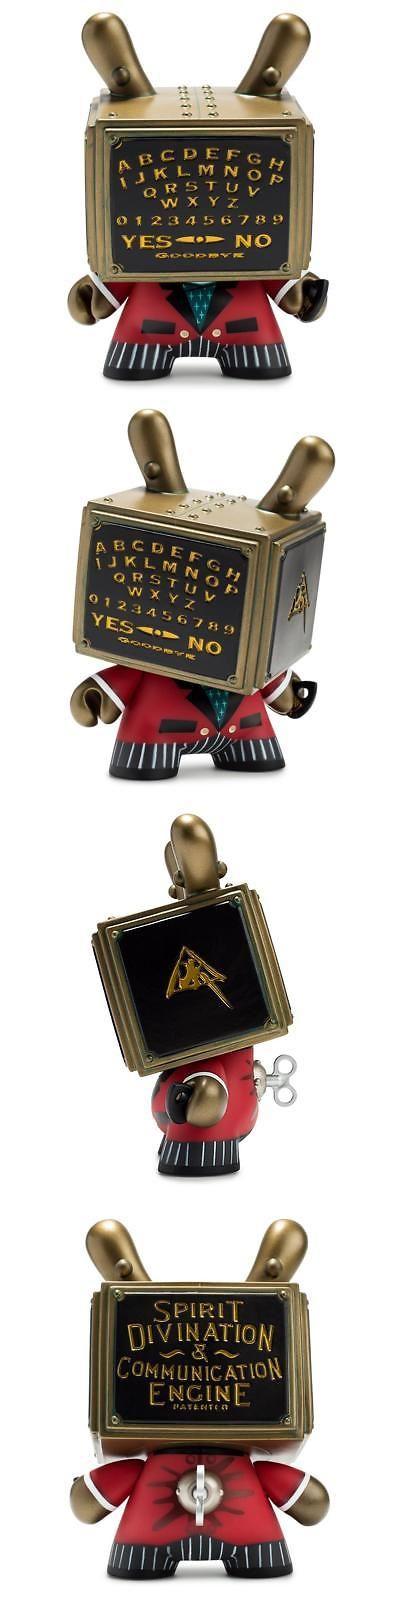 Designer and Urban Vinyl 158672: Kidrobot Talking Board 5 Dunny Vinyl Figure ~ Doktor A, Ouija ~ 1000 Pcs, New -> BUY IT NOW ONLY: $37.95 on eBay!